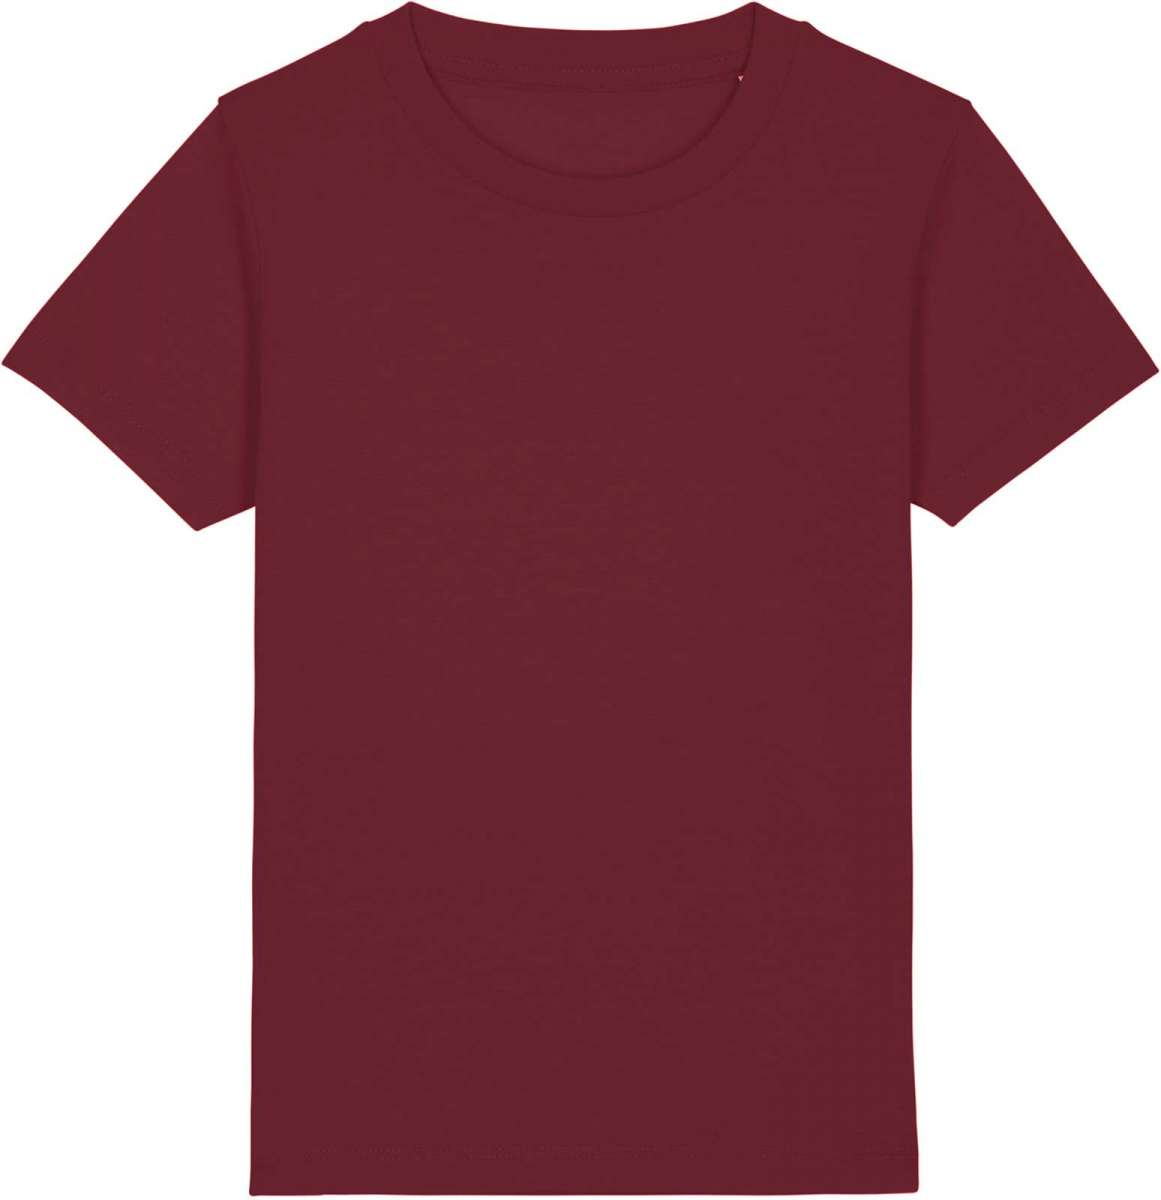 Zay El 3asal | Kid's Basic Cut T-shirt